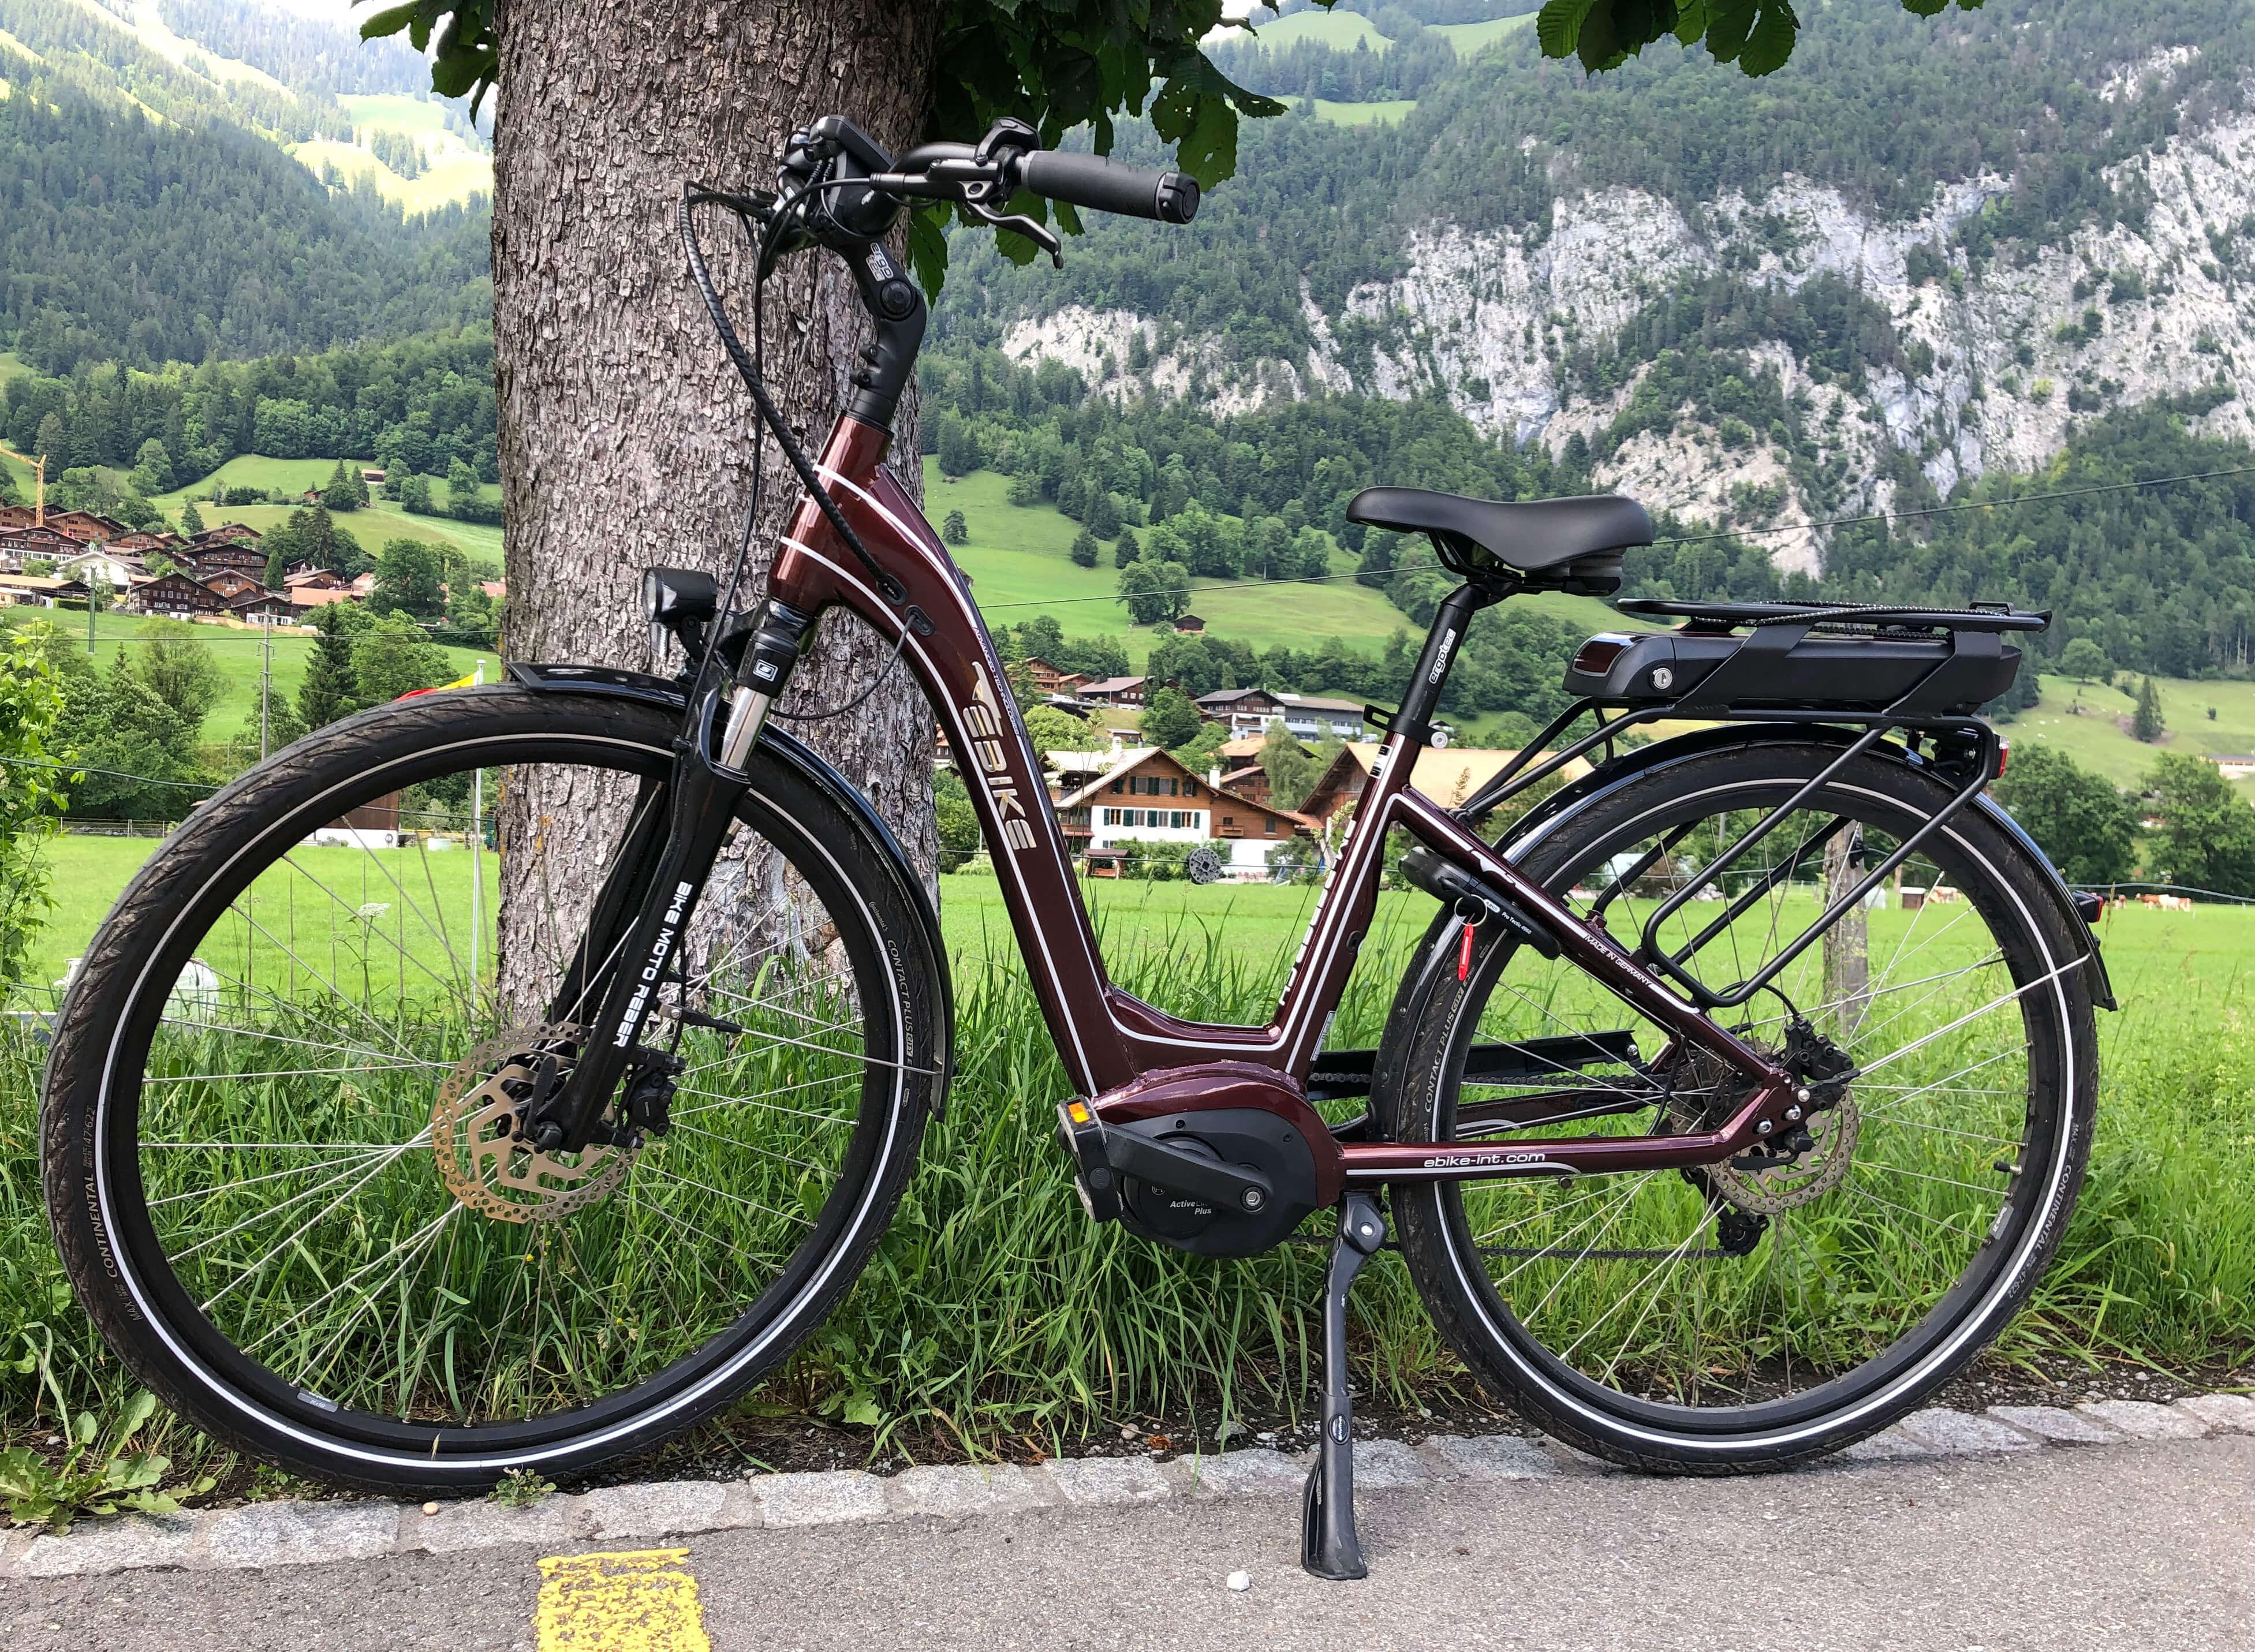 Bike der Marke Burbon Street